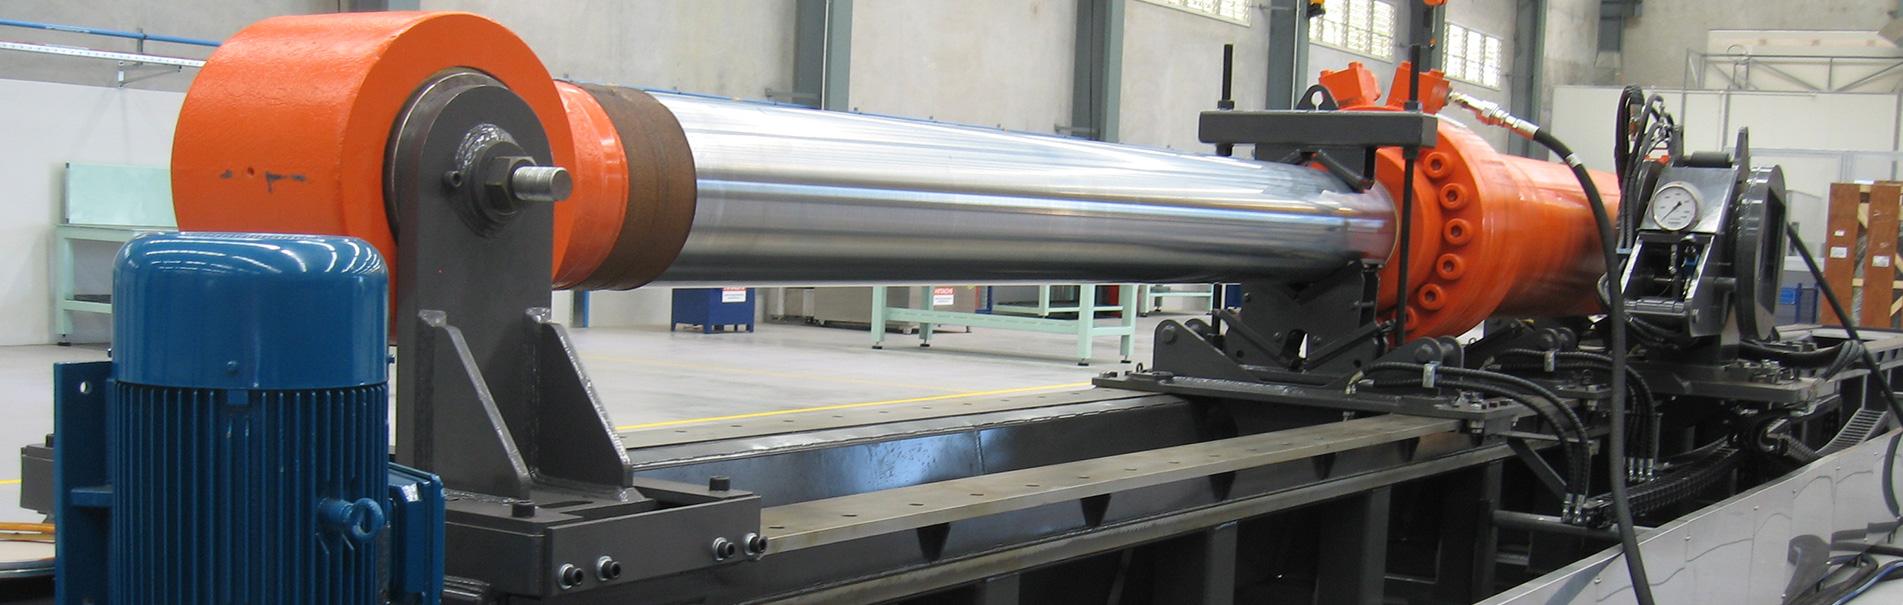 Hydraulic Cylinder Service Bench Jaws Pty Ltd